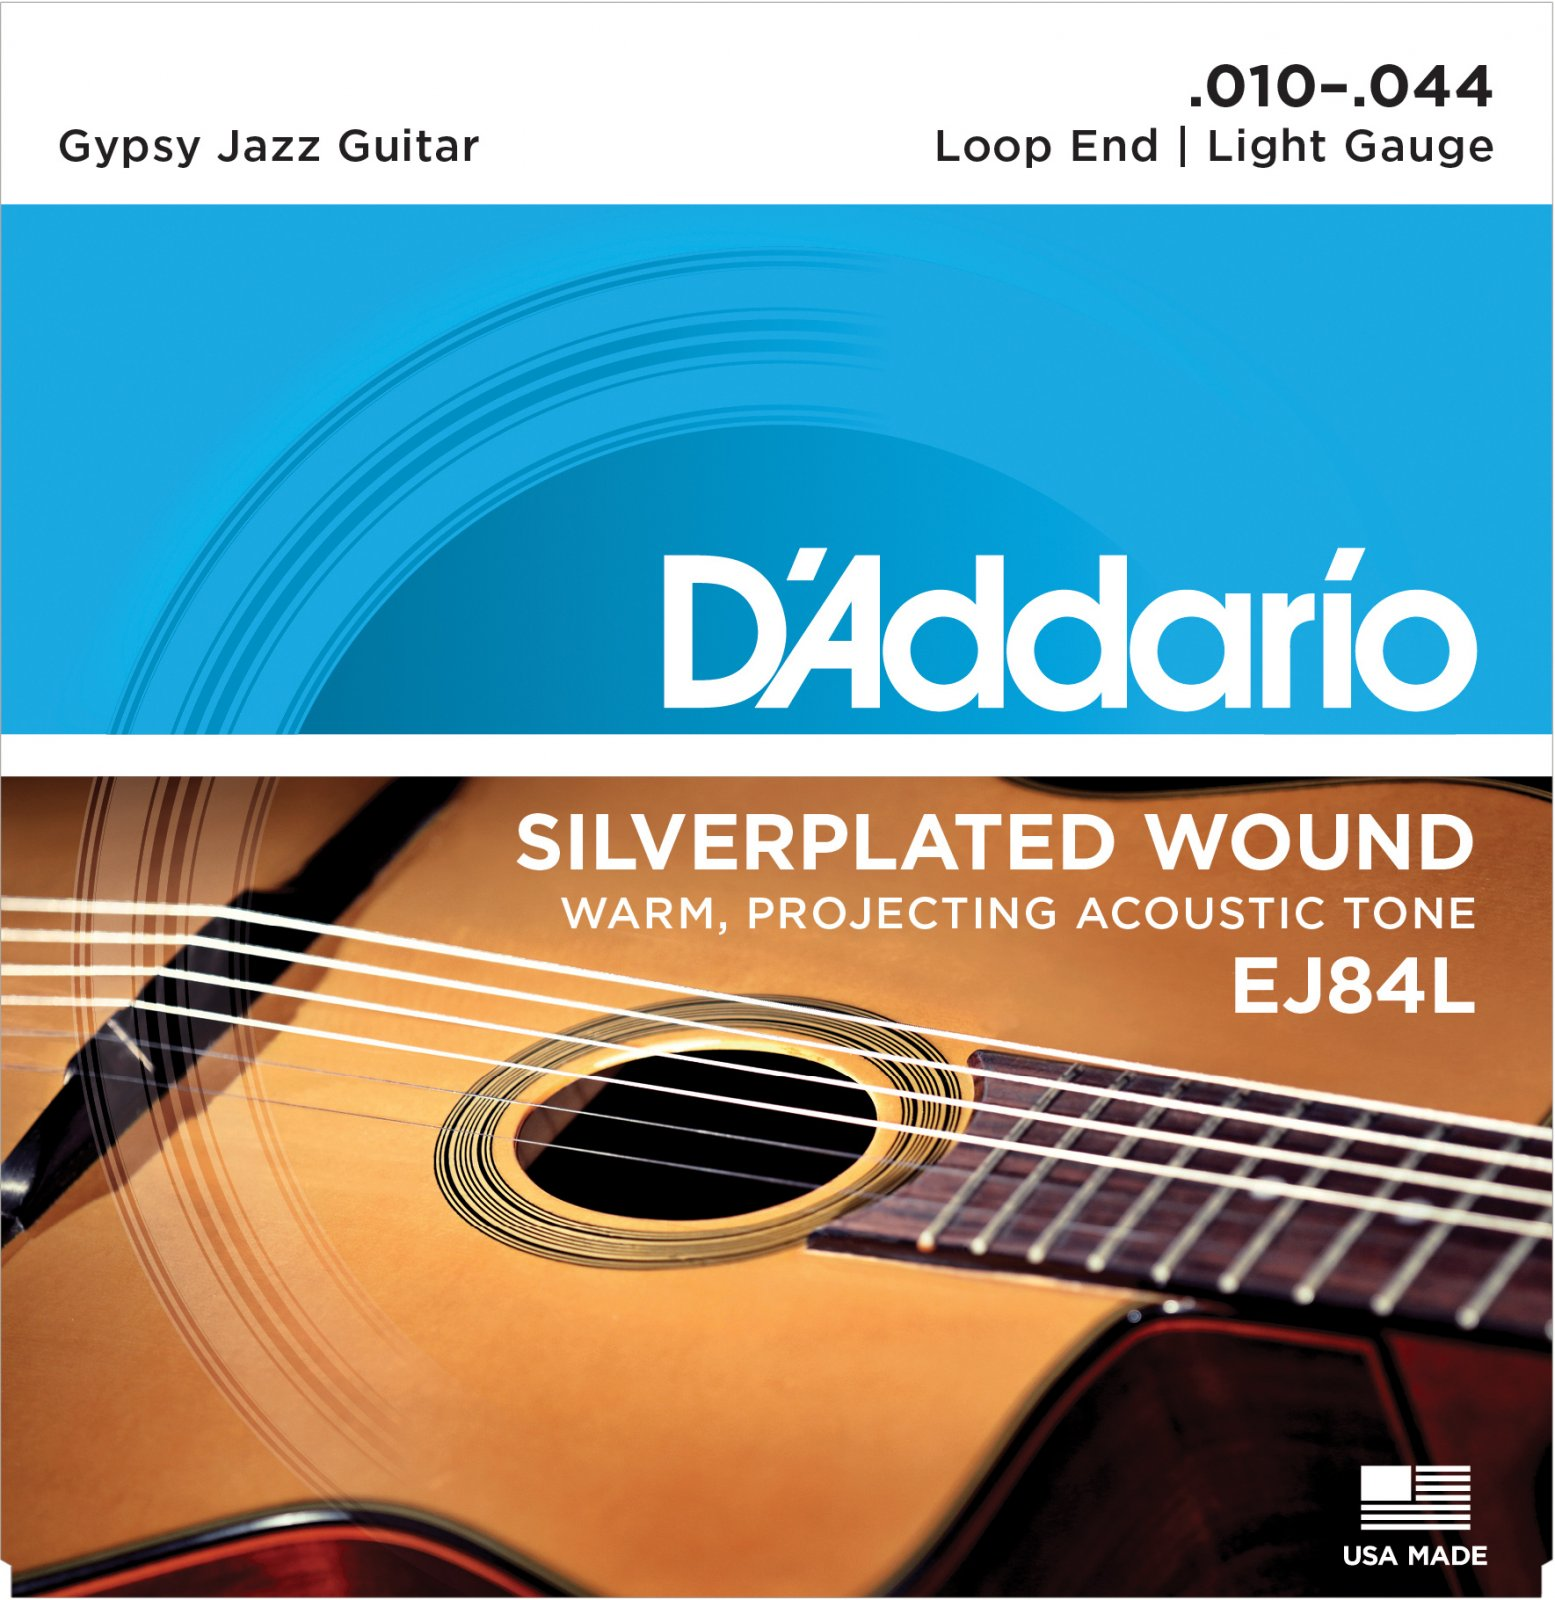 D'Addario EJ84L Gypsy Jazz Acoustic Guitar Strings Loop End Light